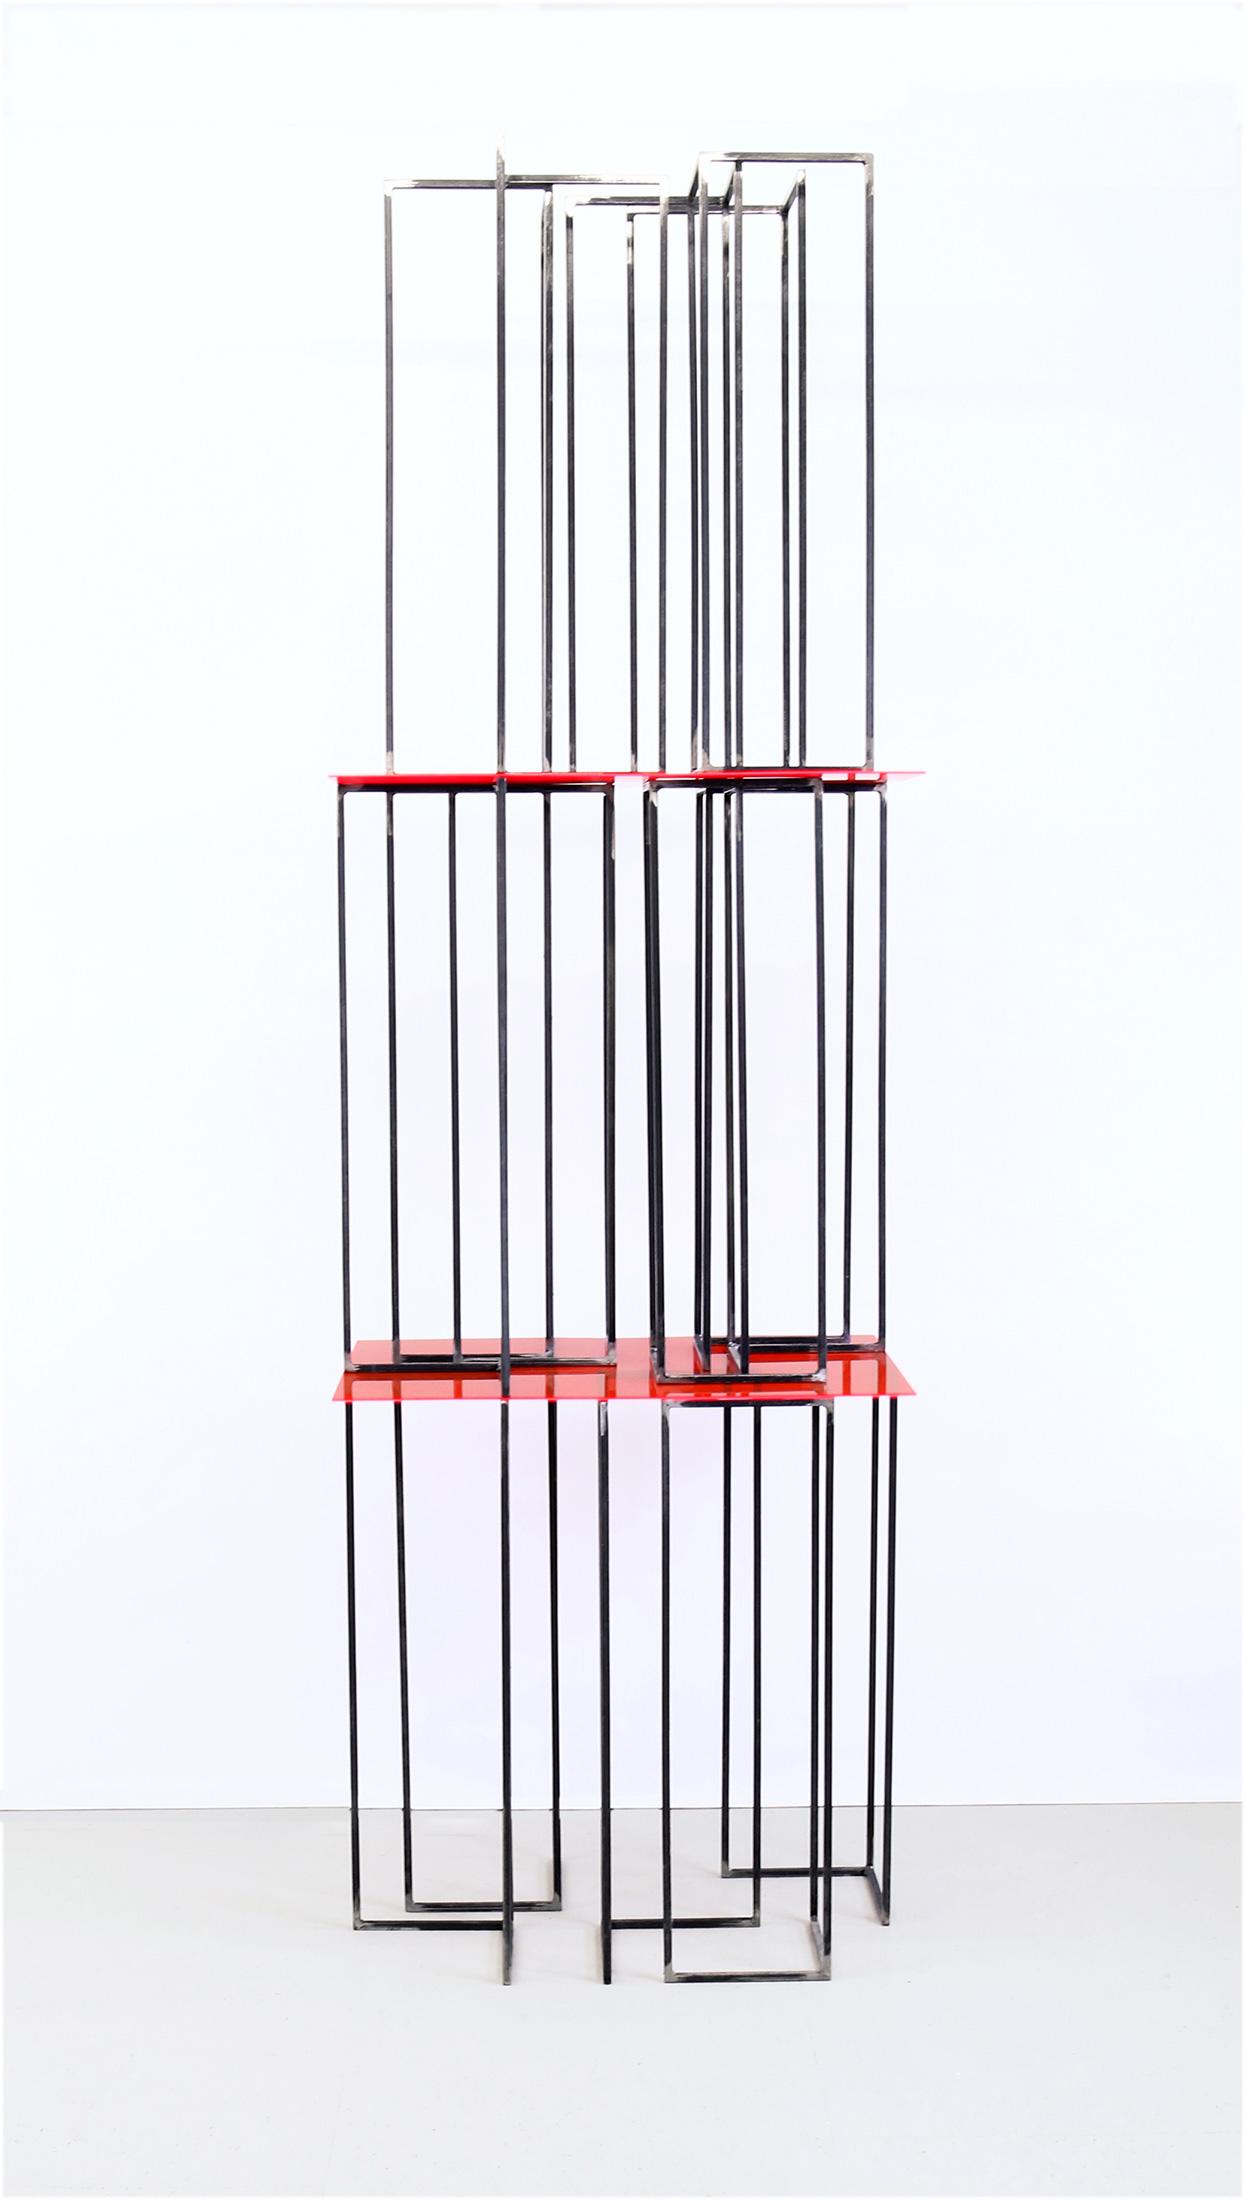 translucide  V | 2021 | Beton, Acrylglas , Metall | 60 x 80 x 220 cm